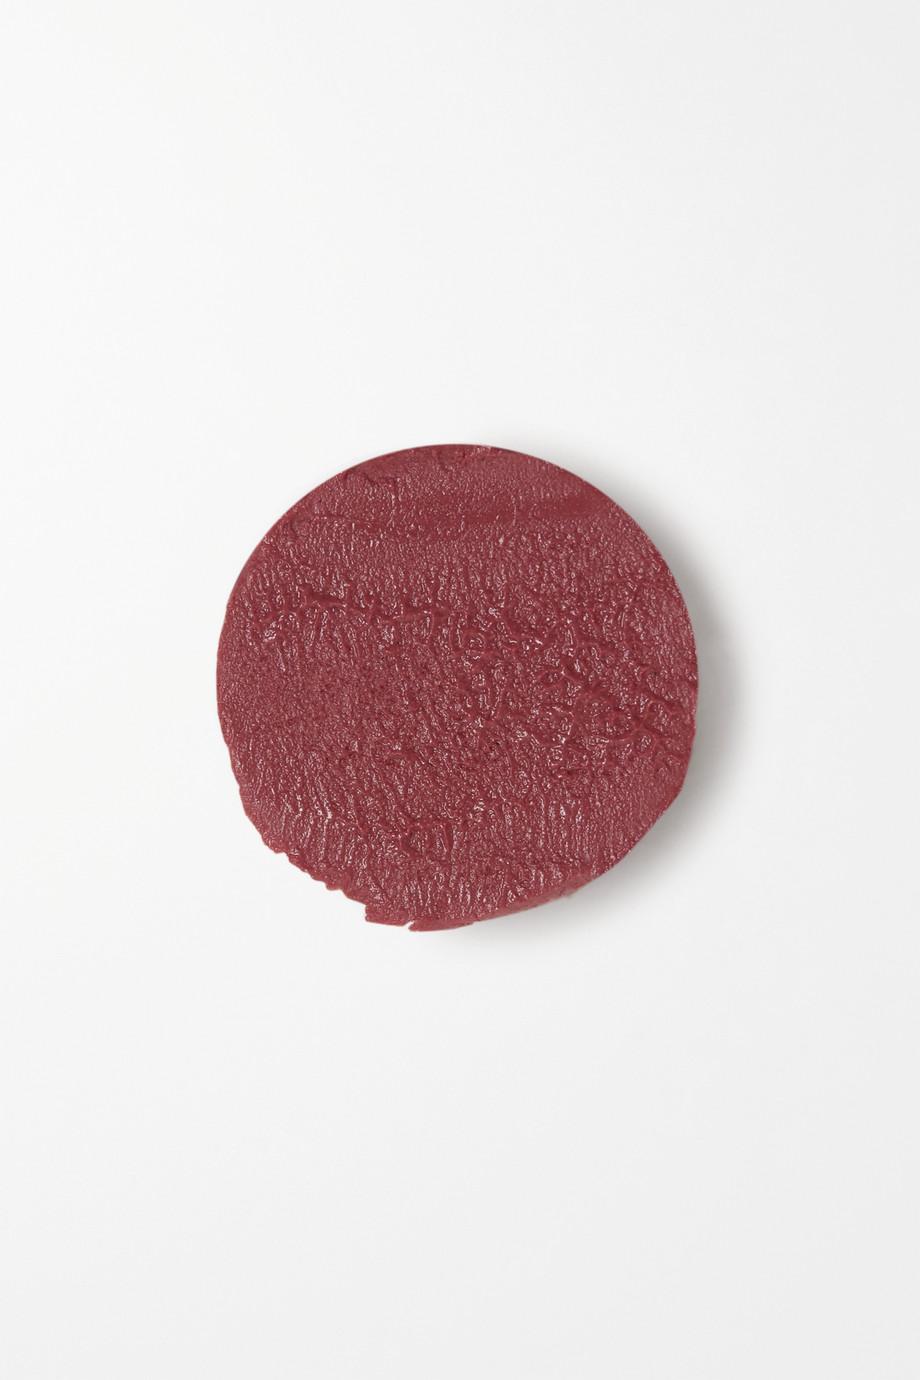 Ilia Tinted Lip Conditioner - Forever